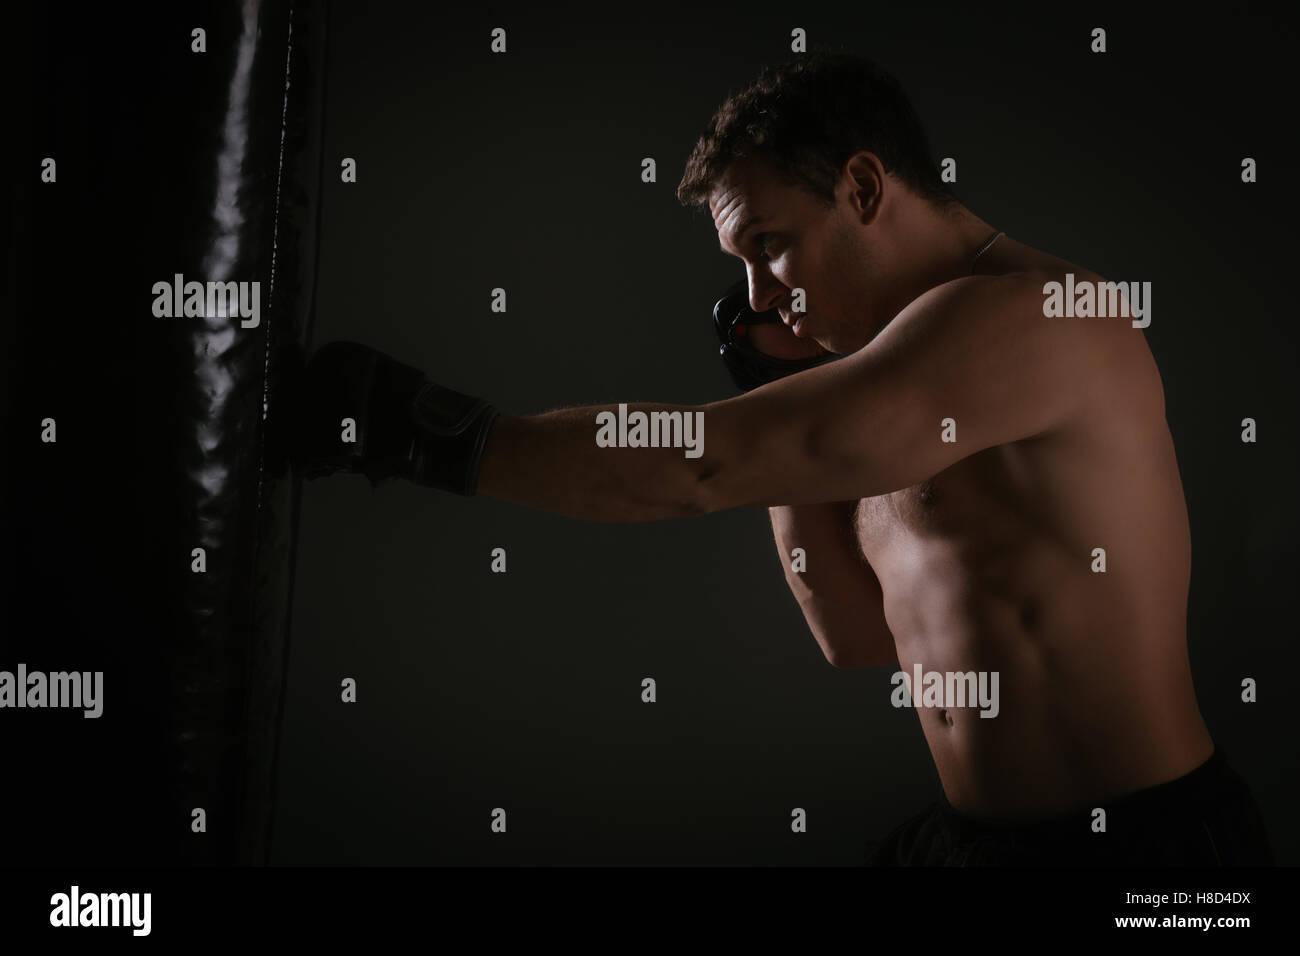 Training On A Punching Bag - Stock Image